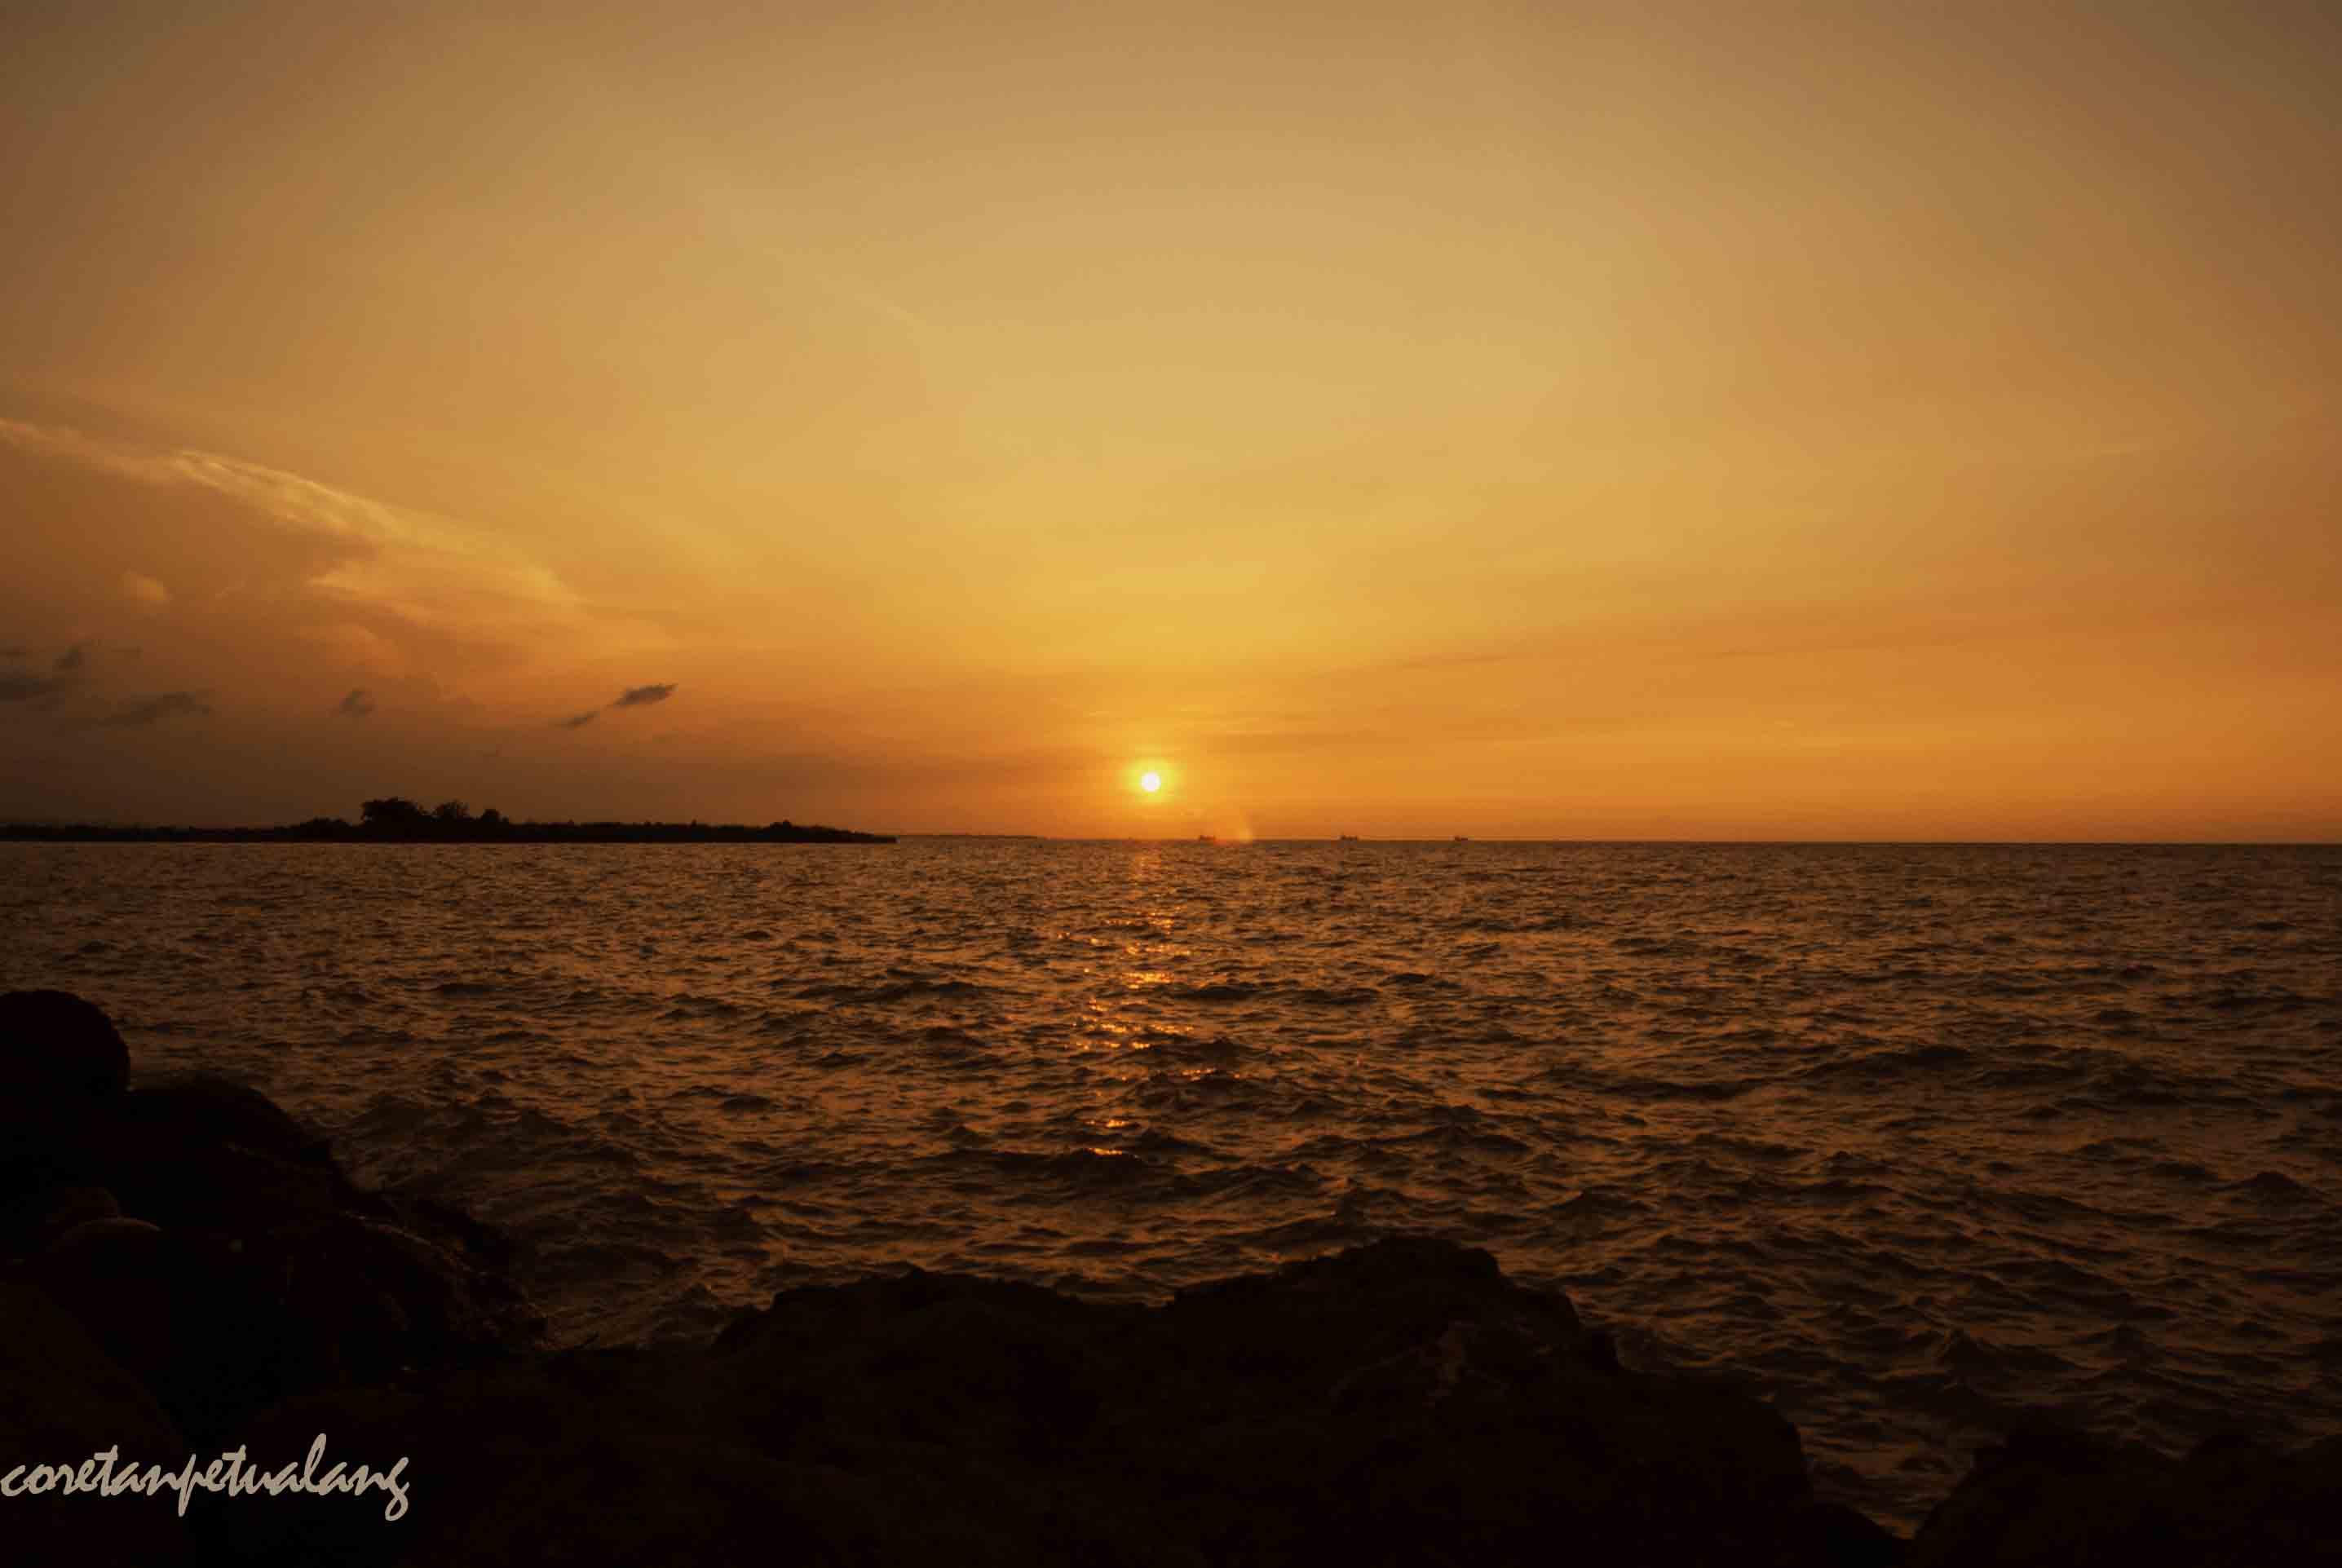 Biro Wisata Fortekindo Tour Pantai Marina Semarang Sebenarnya Hasil Reklamiasi